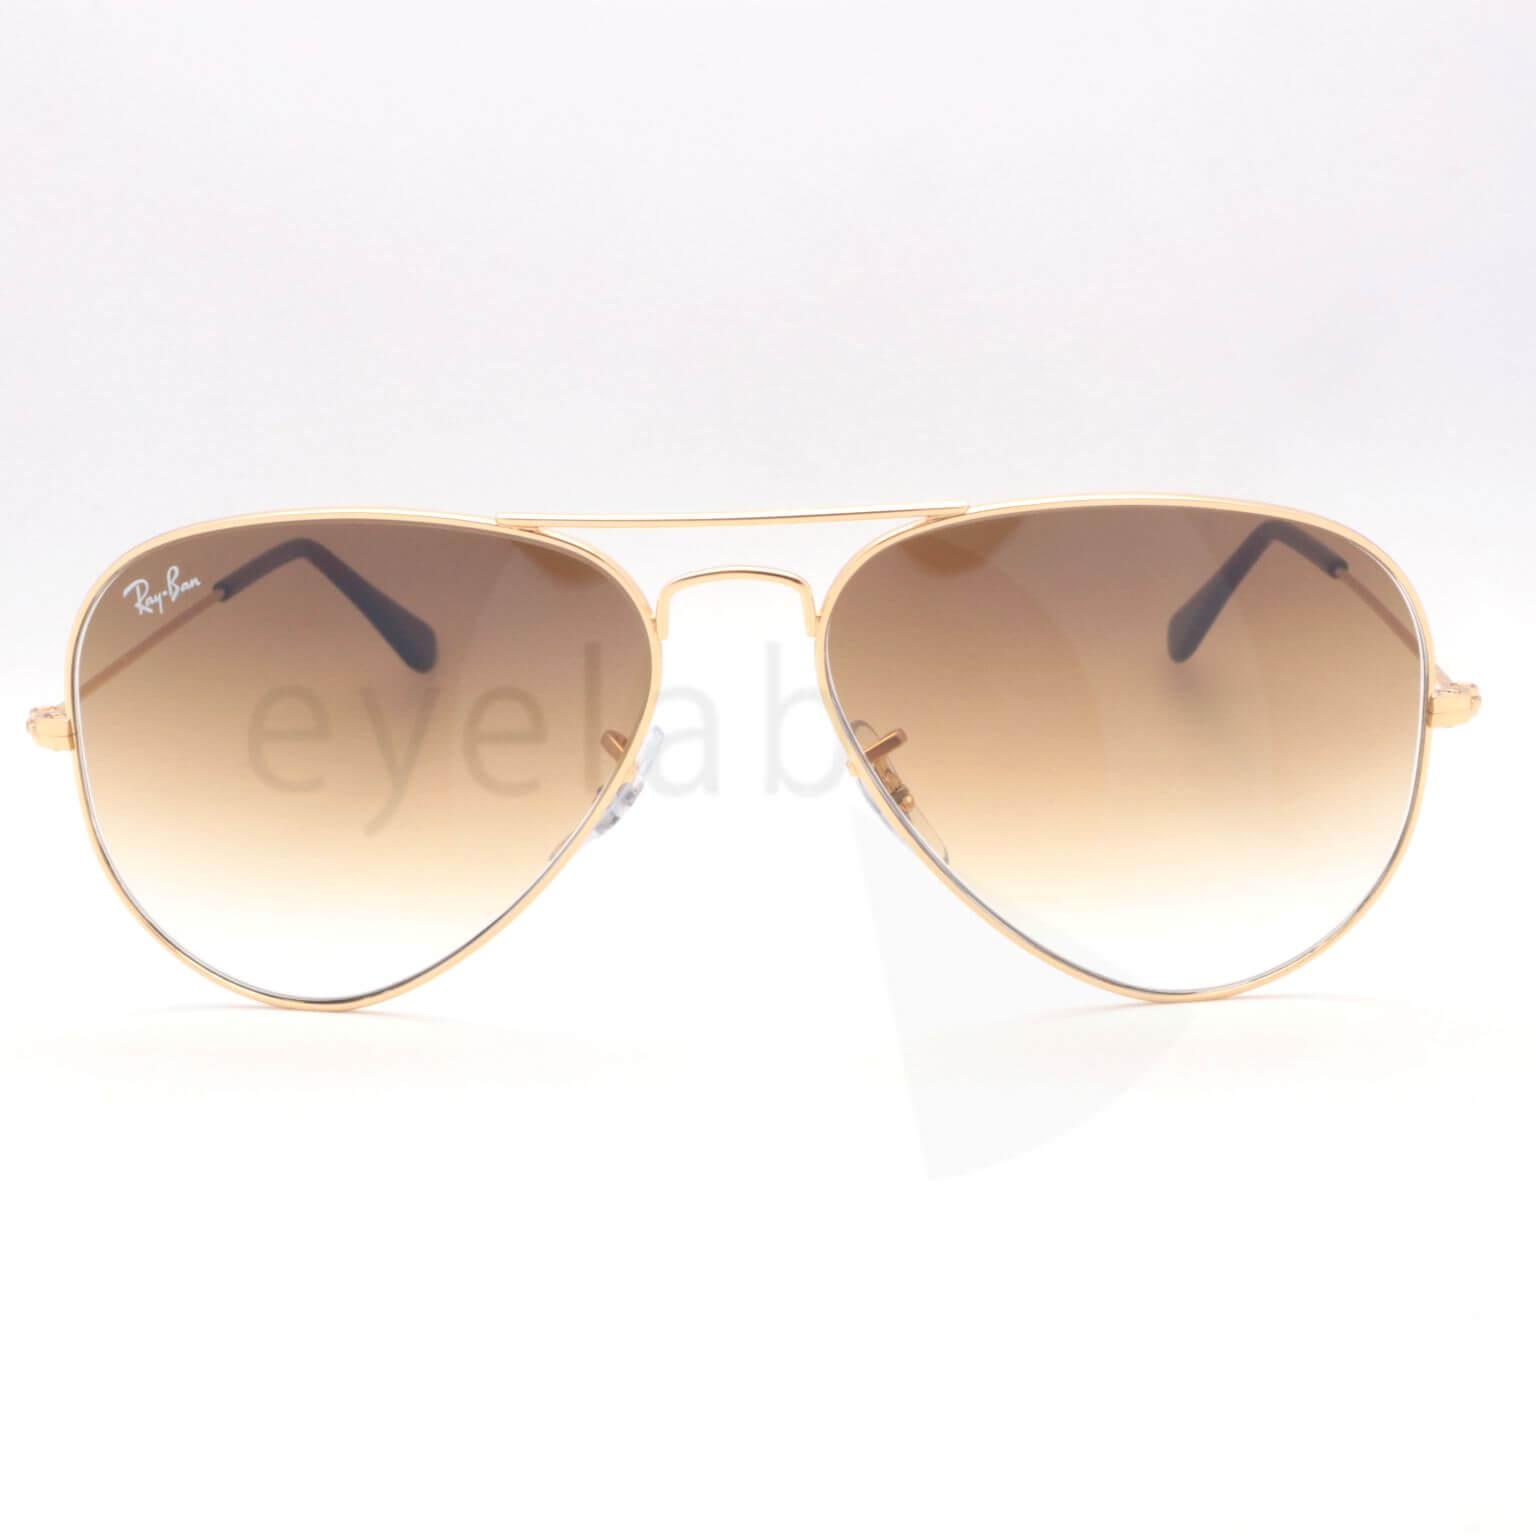 f088dc04c4 Γυαλιά ηλίου Ray-Ban Aviator 3025 001 51 58 ~ Οπτικά Eyelab